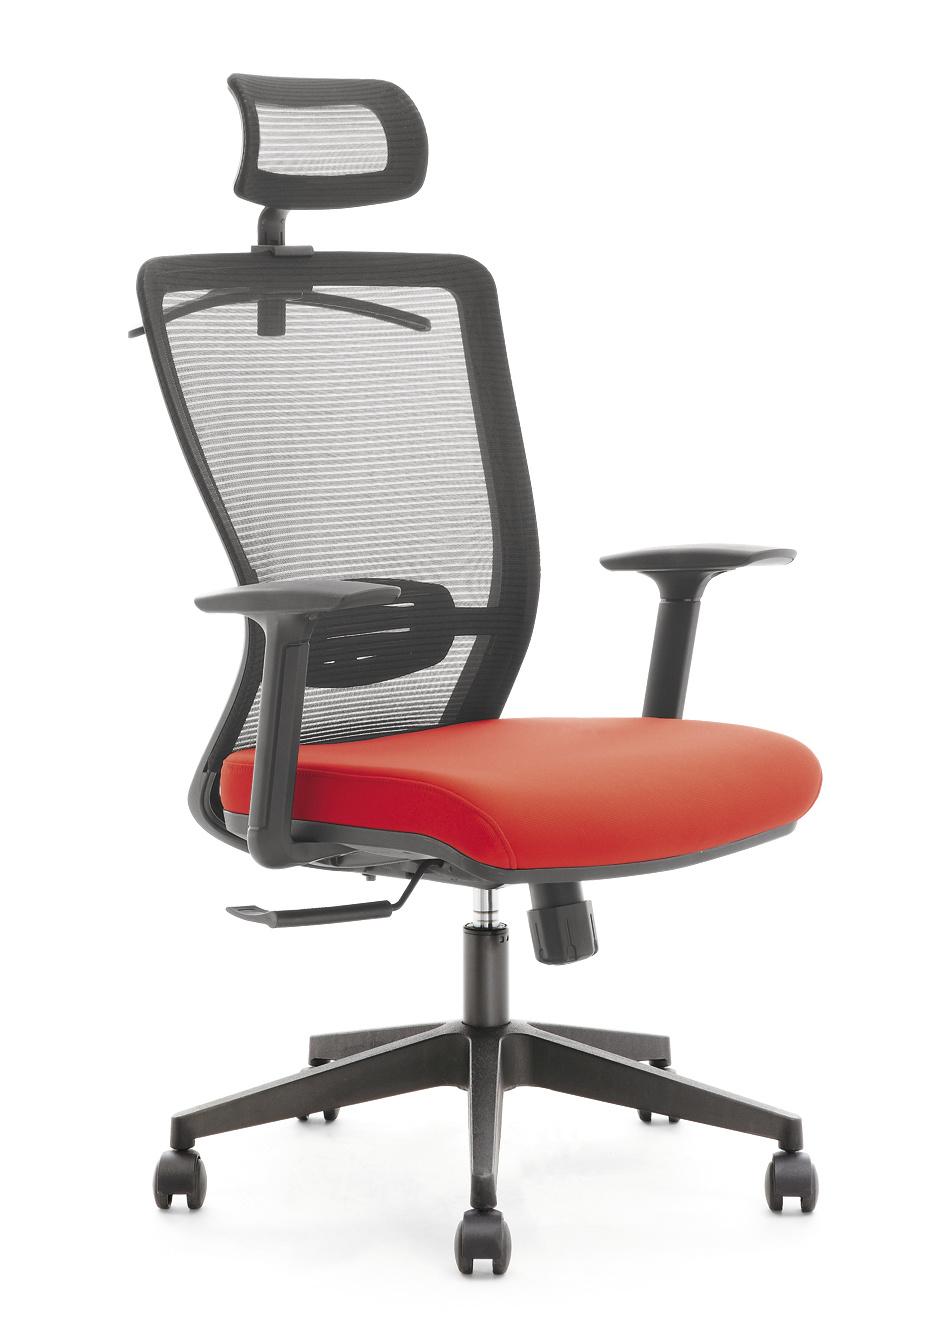 Hot Item Full Mesh Chairs Executive Swivel Chair Ergonomic Office Furniture